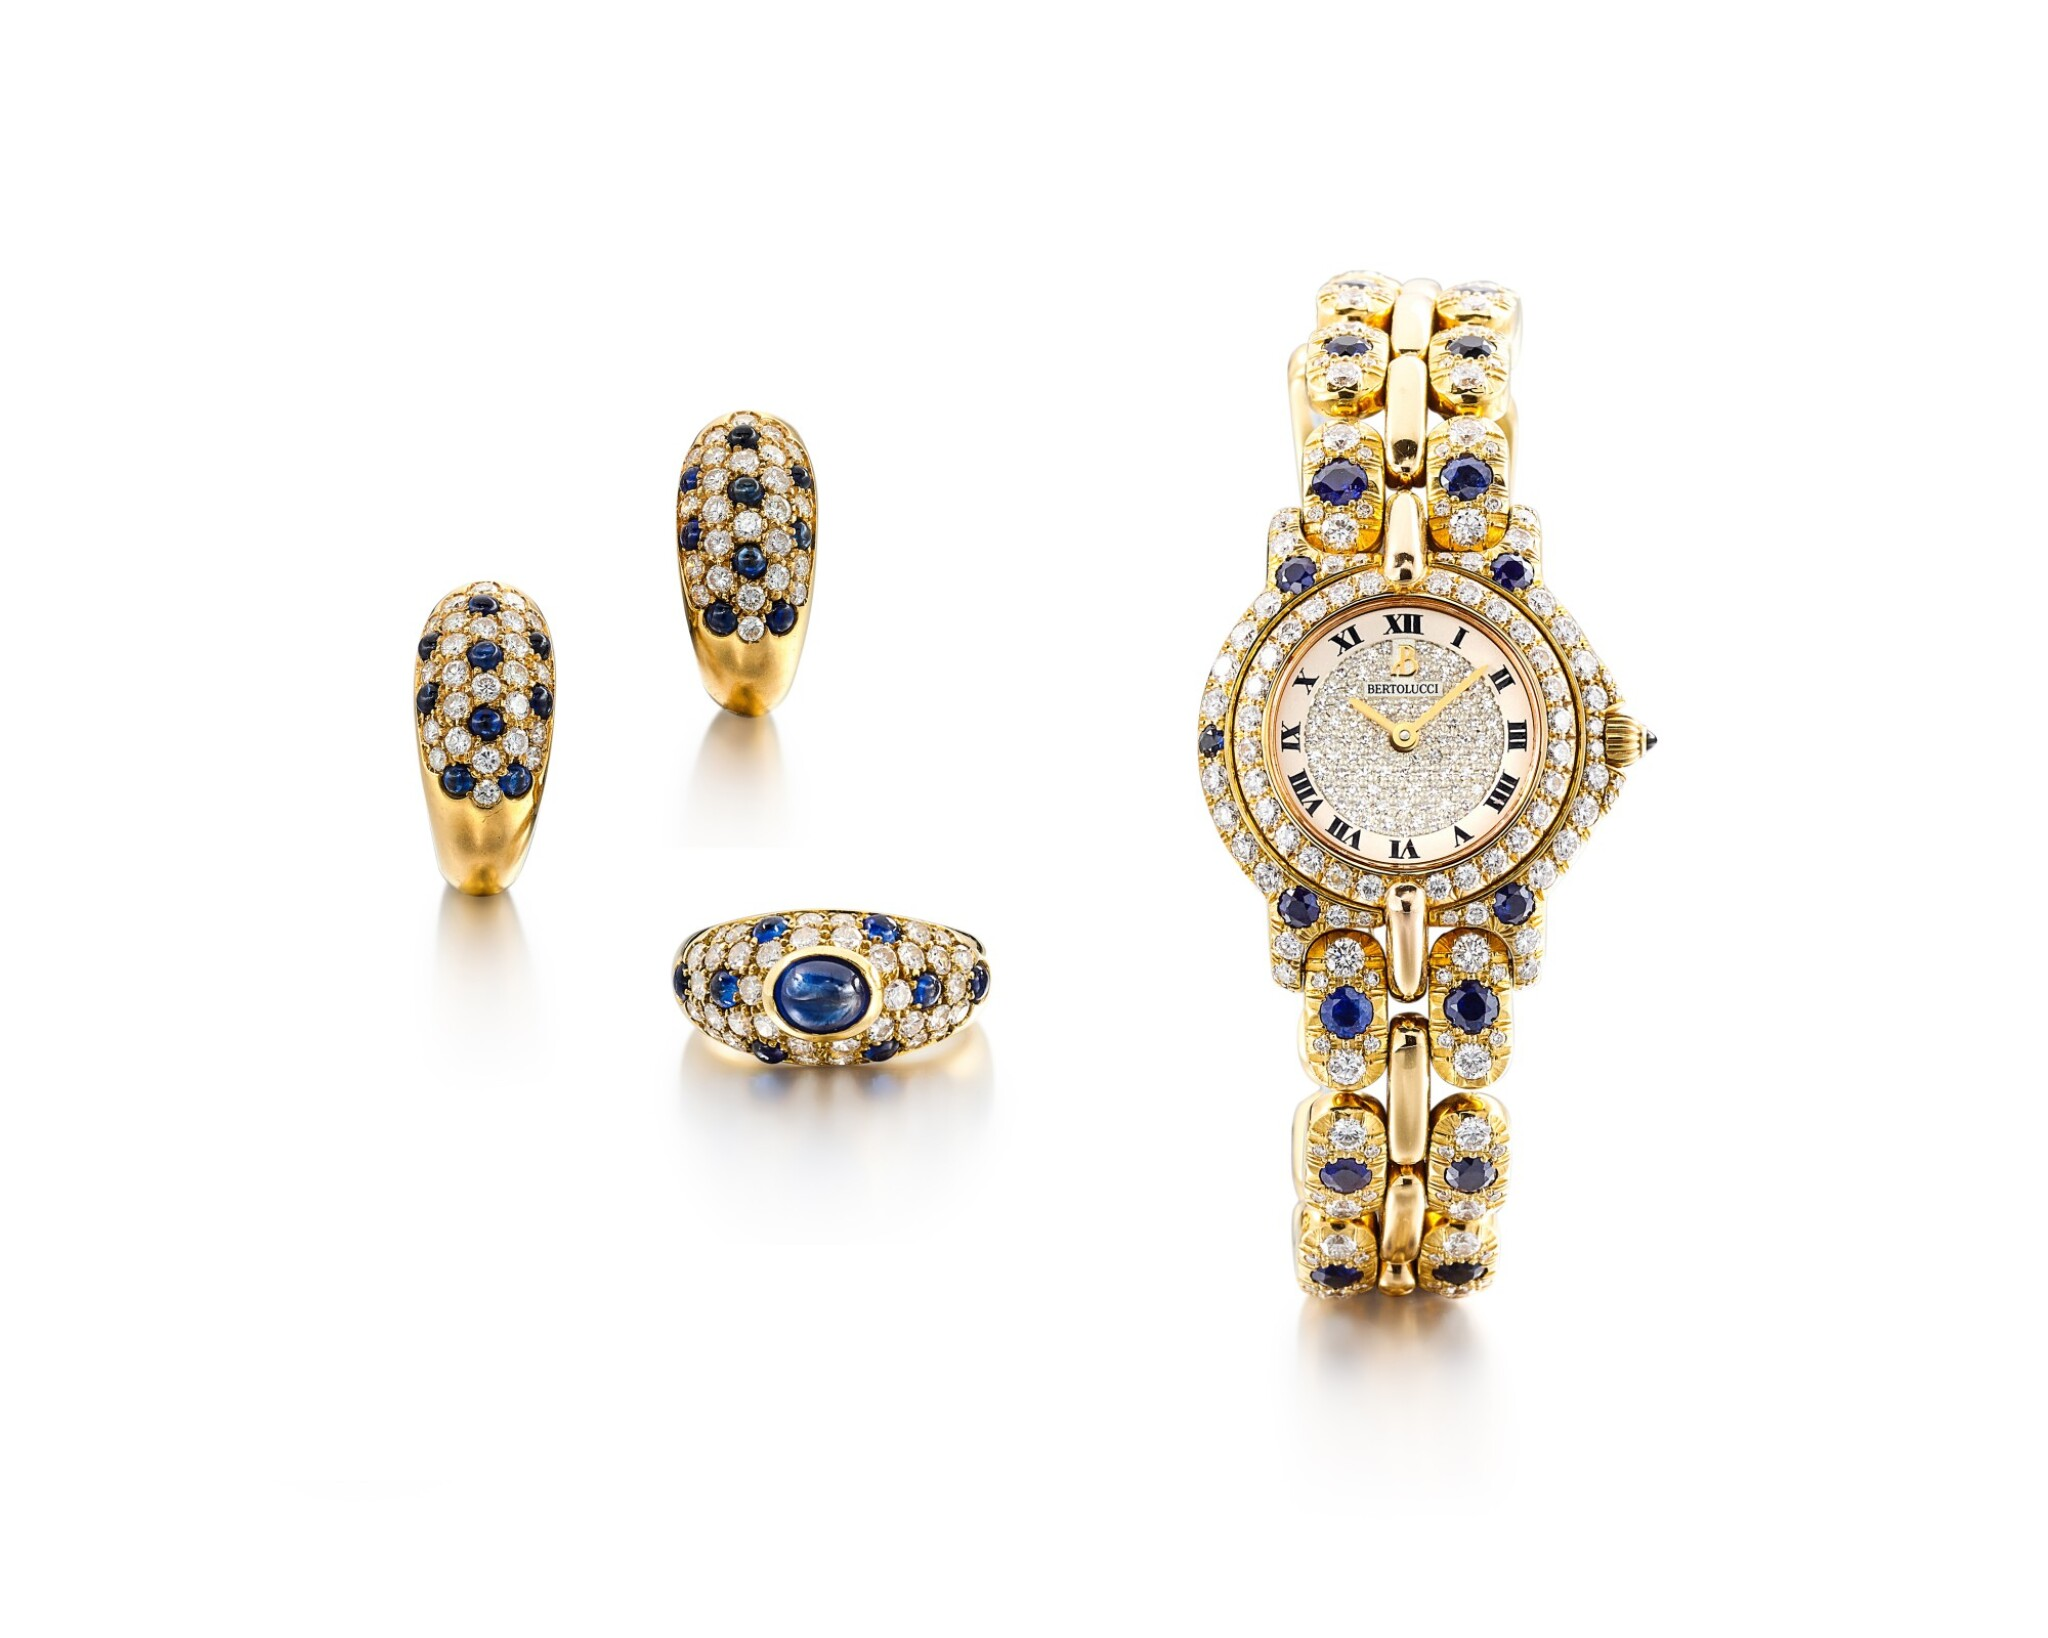 View full screen - View 1 of Lot 1612. Diamond and Sapphire Demi-Parure and 'Pulchra' Wristwatch | 卡地亞及Bertolucci | 鑽石 配 藍寶石 戒指及耳環套裝 及'Pulchra' 腕錶.